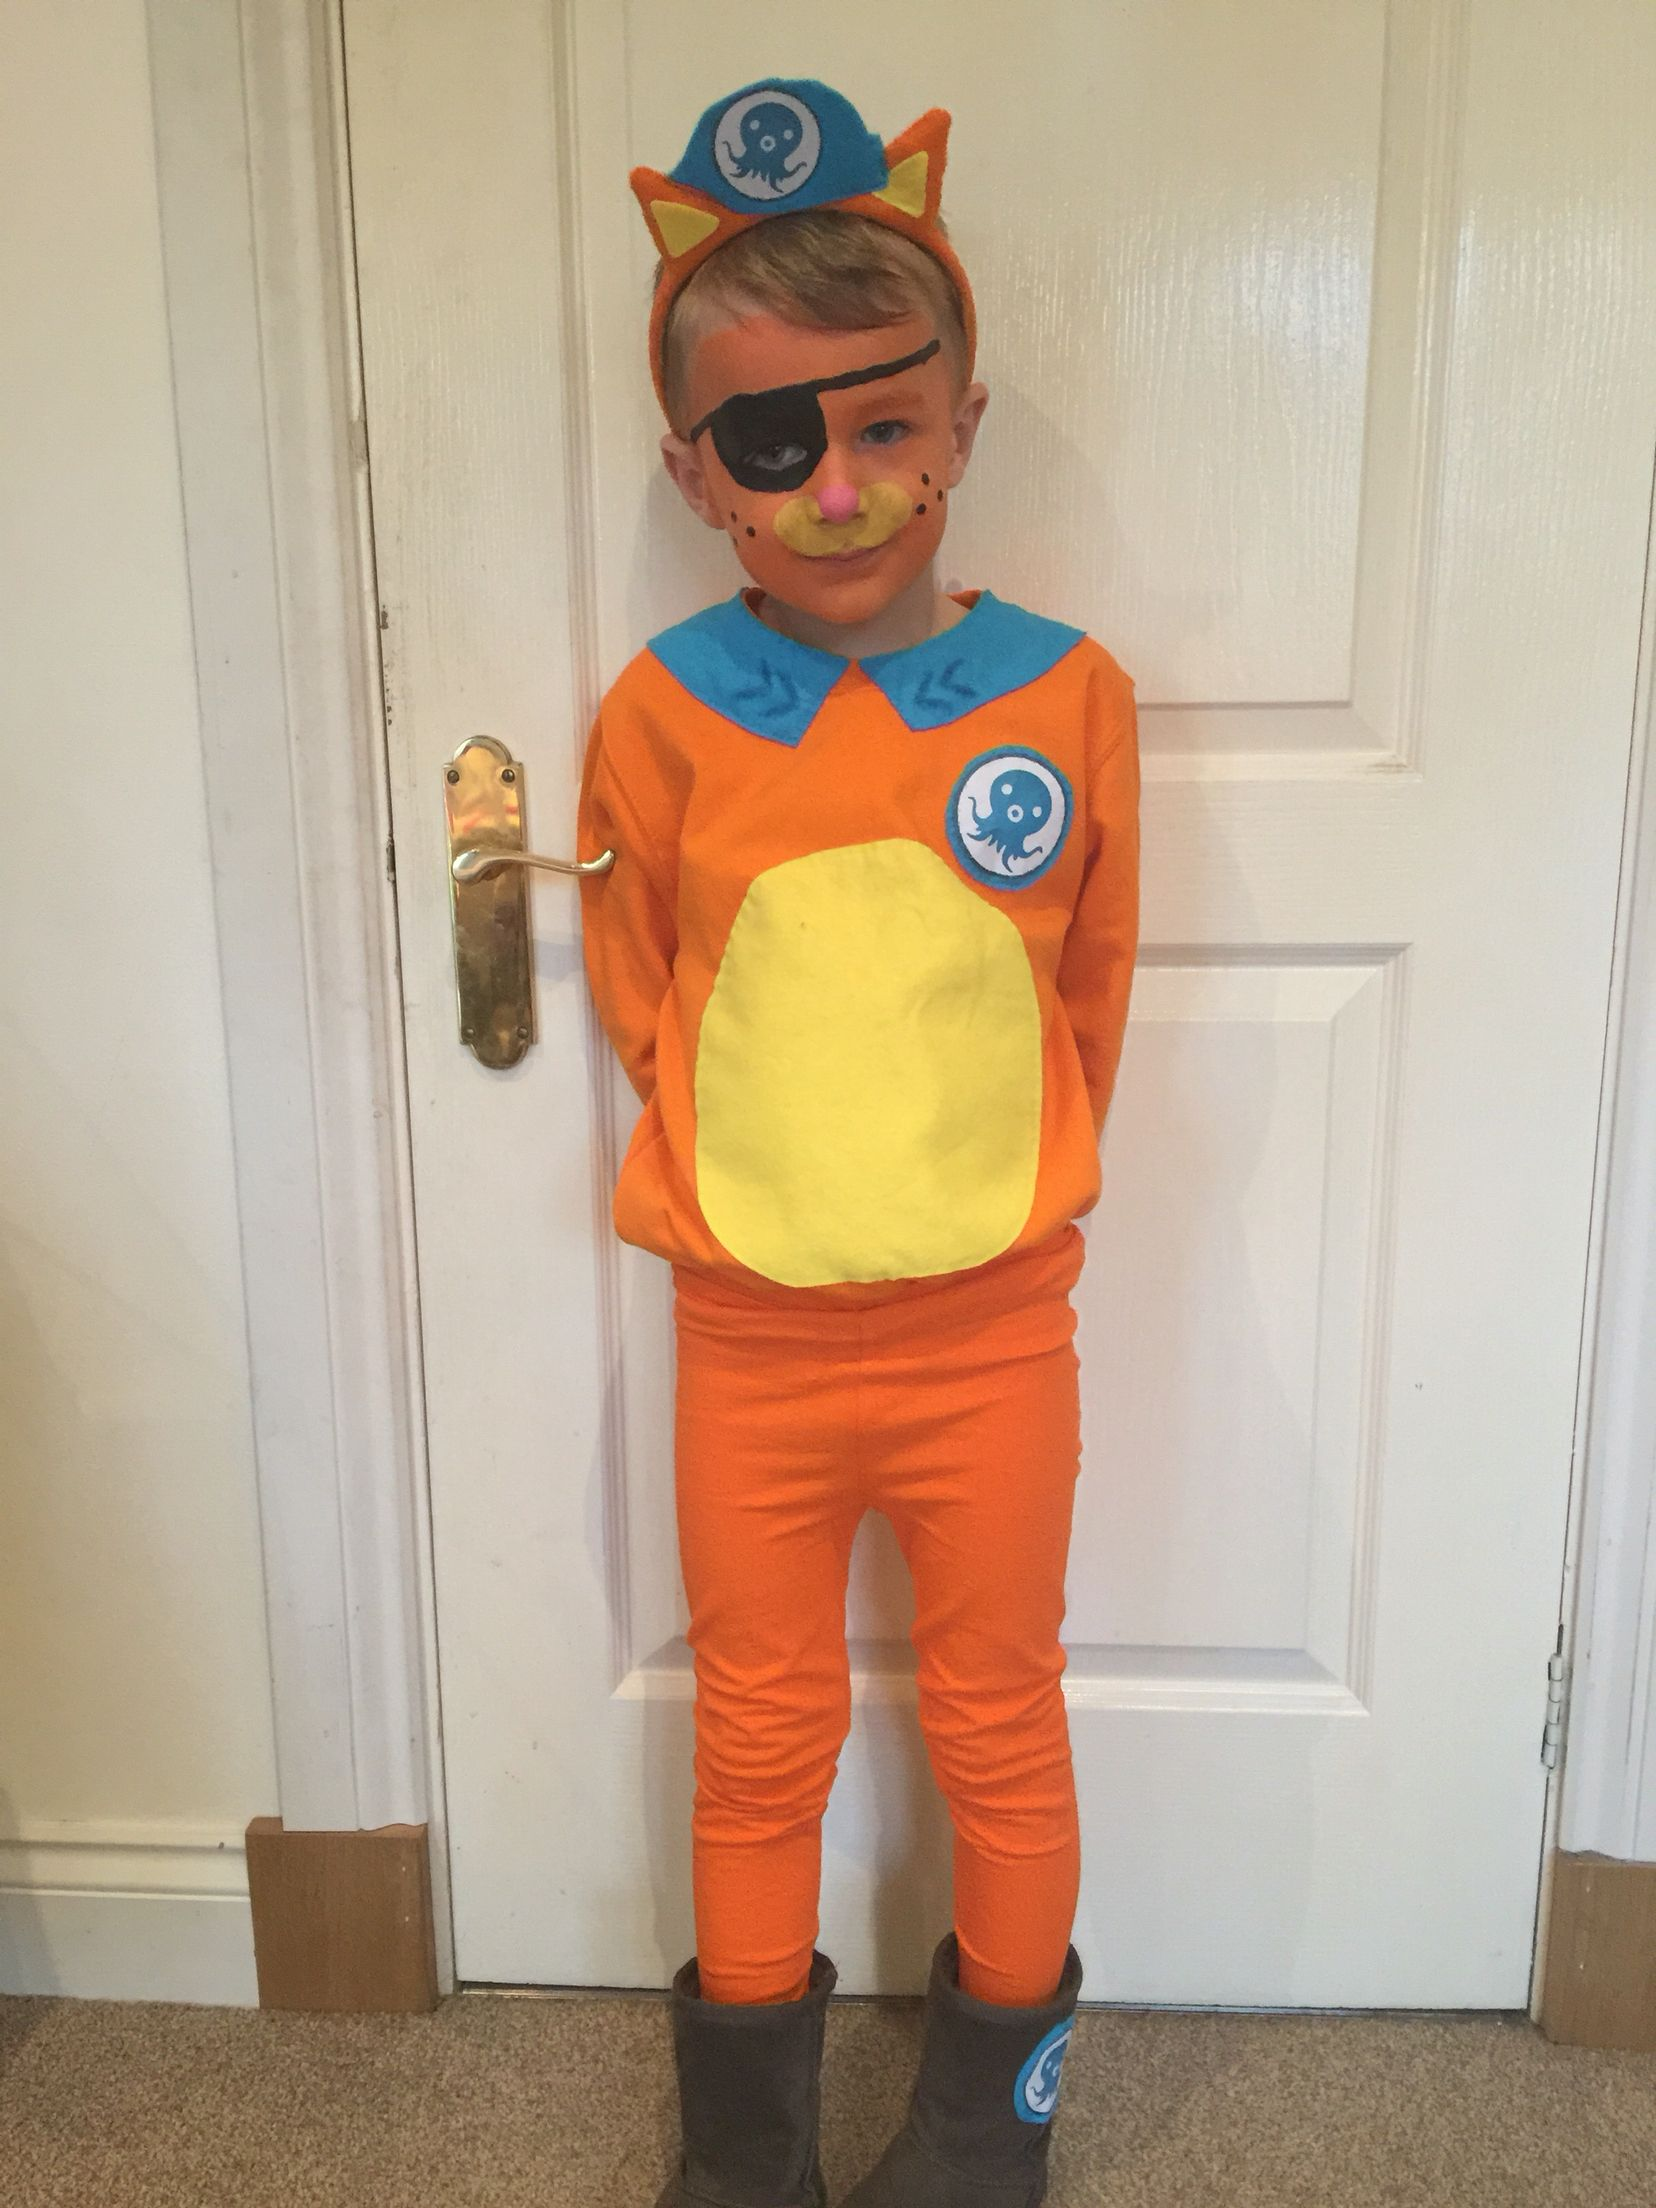 924a4c5ee85 Homemade Octonauts costume Kwazzi